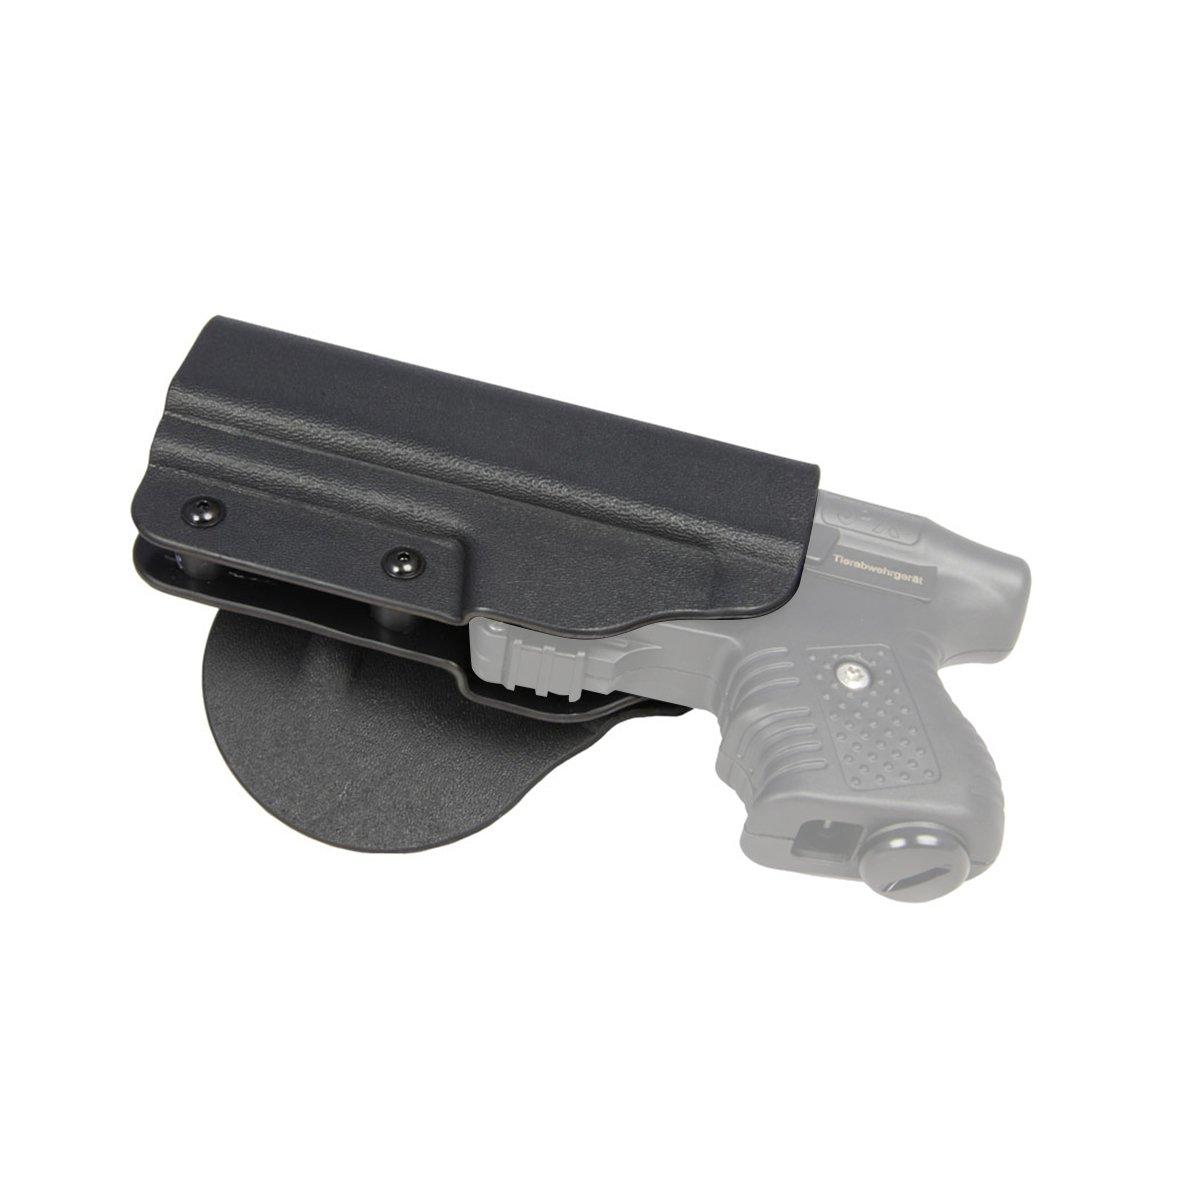 Paddleholster für JPX Jet Protector Linkshänder Pfefferspraypistole Holster